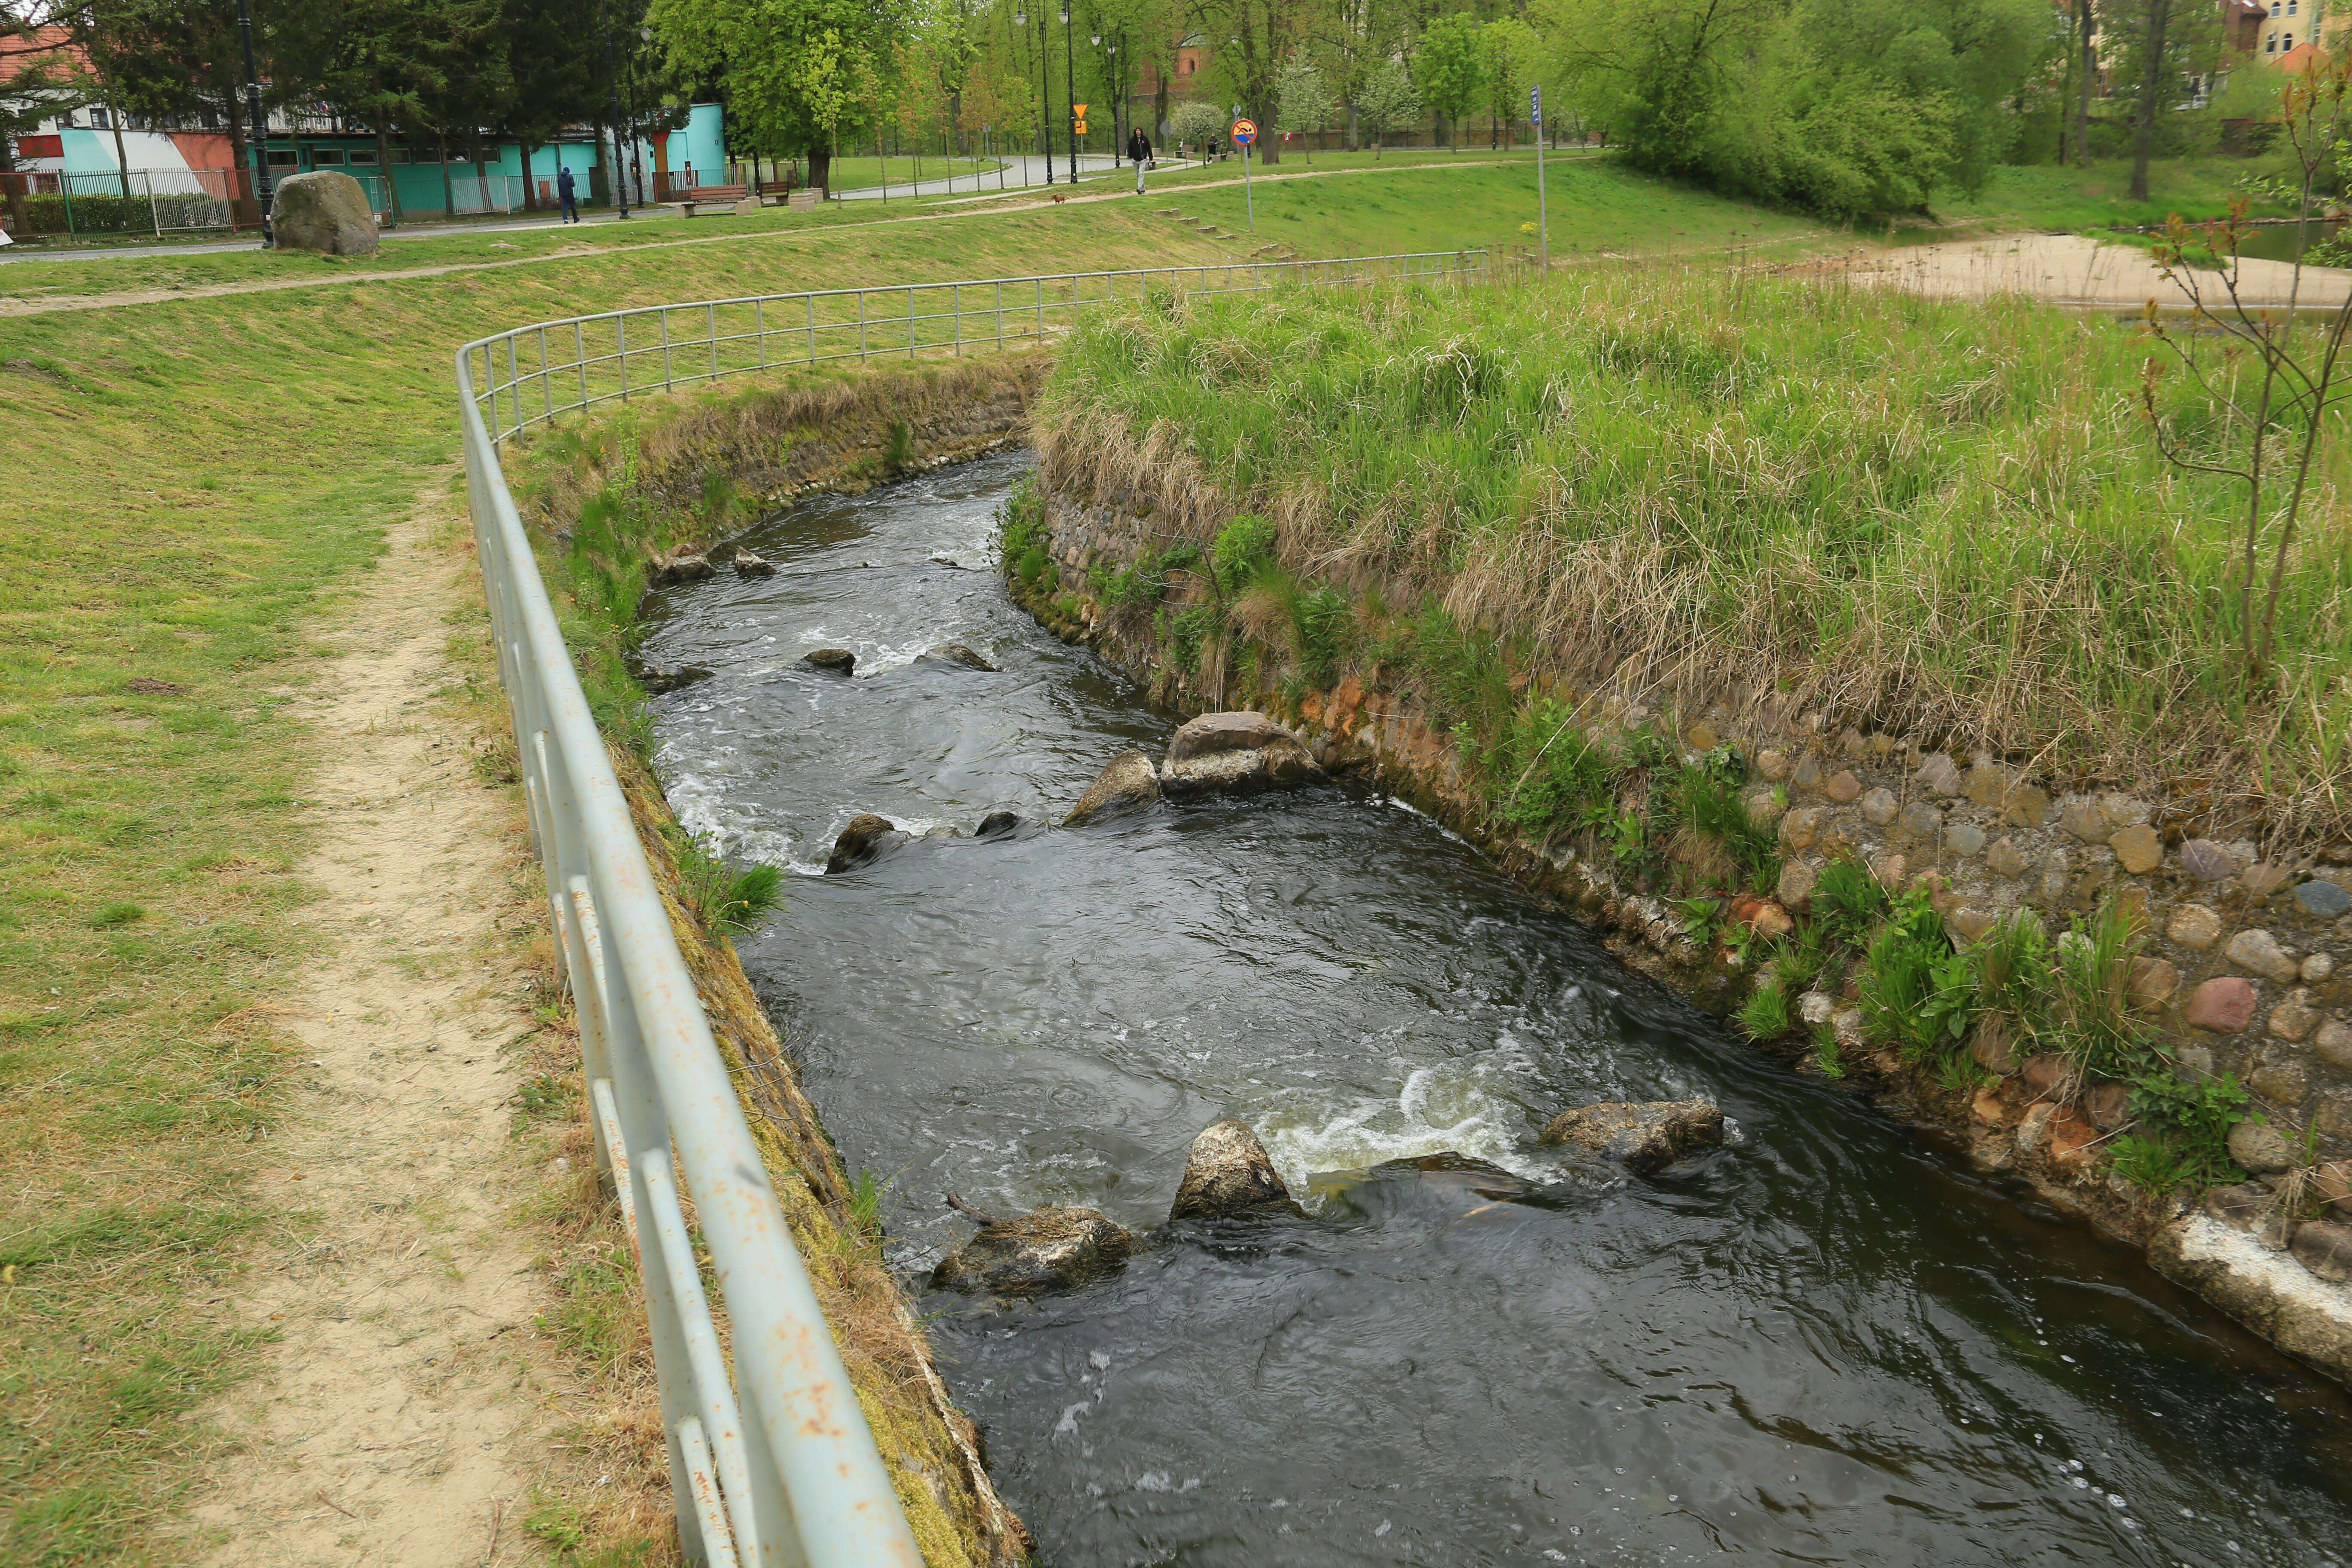 Channel fish pass on the river Pasłęka, Braniewo